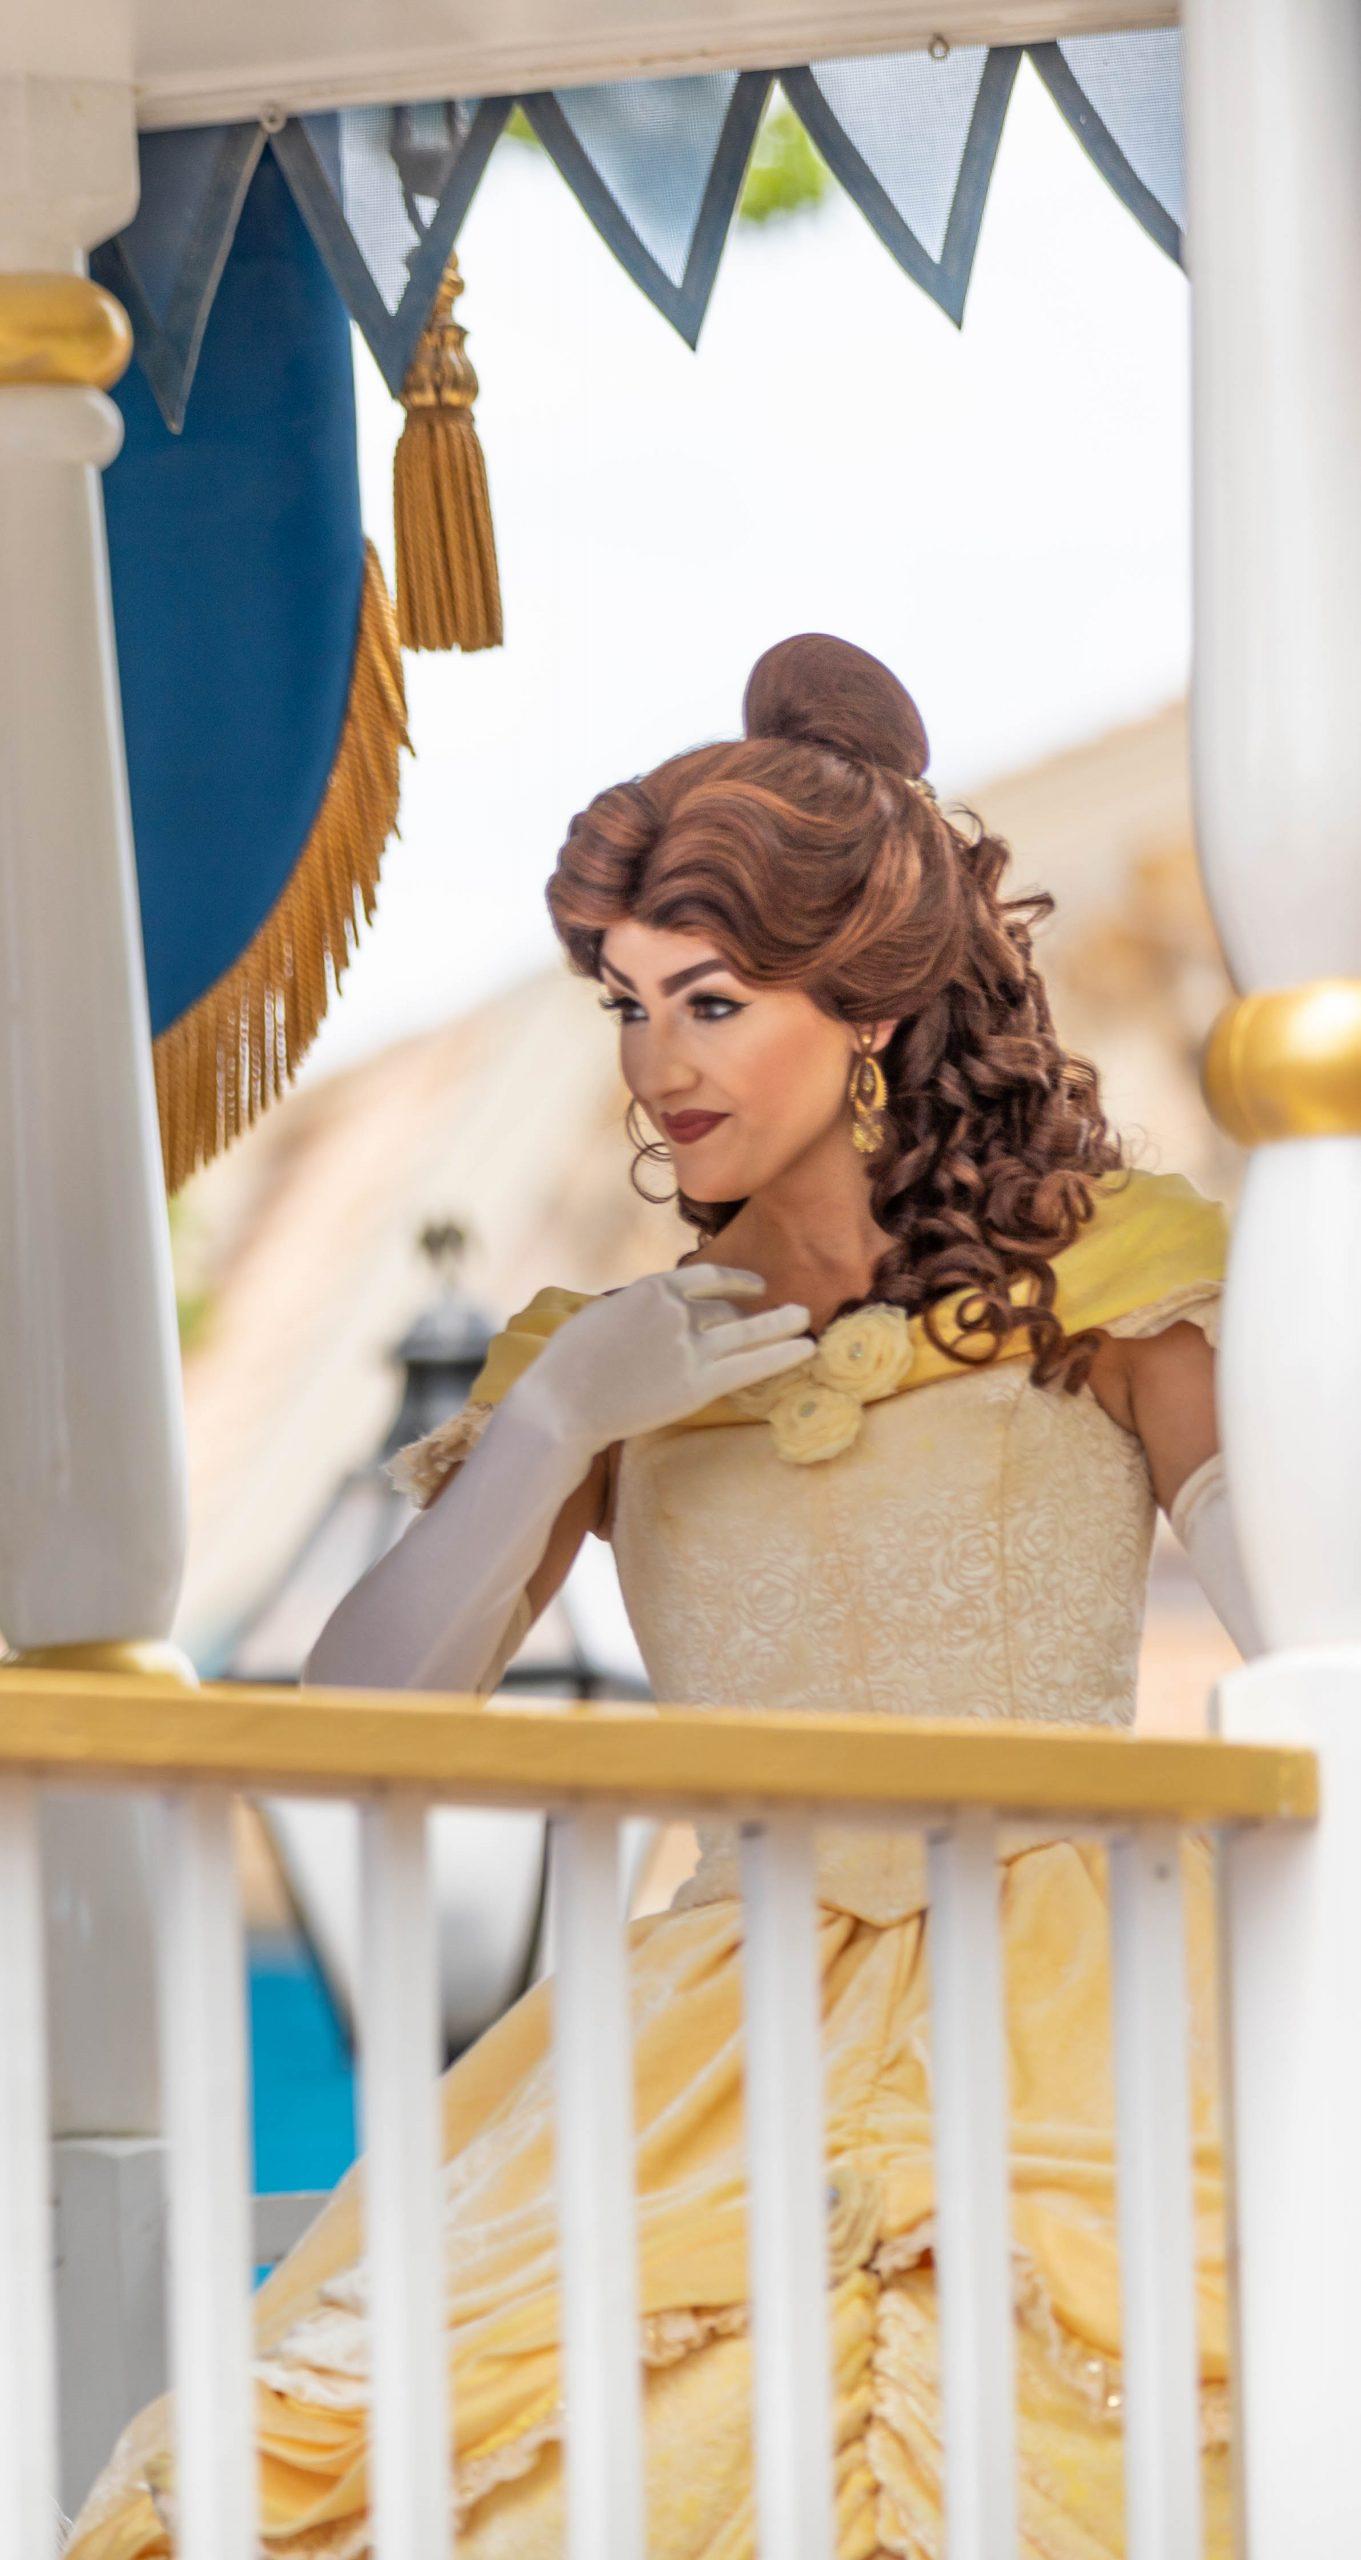 Photograph of Disney Princess Belle at Walt Disney World Photographed by Luxury Travel Writer Annie Fairfax